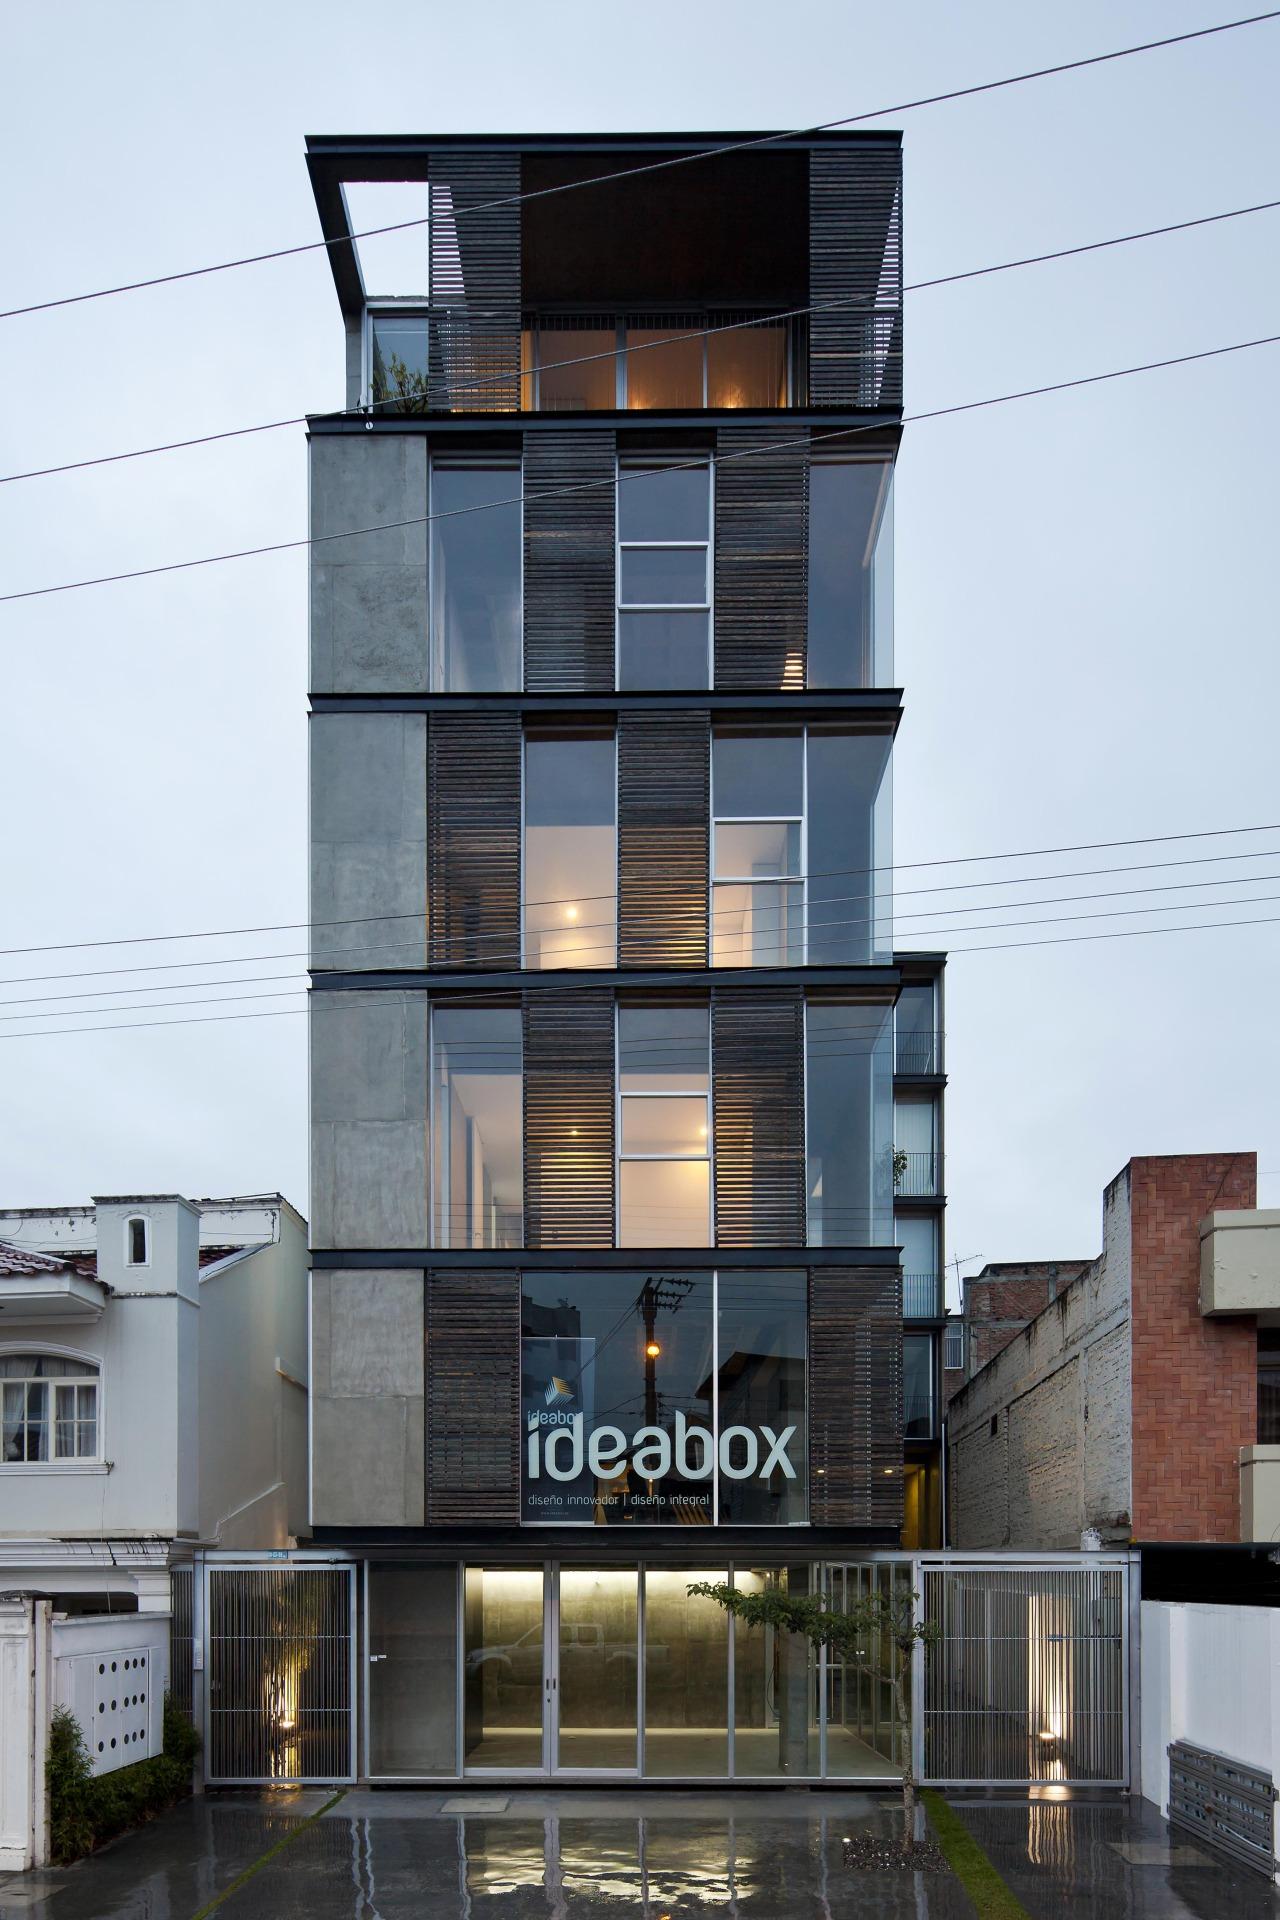 Edificio 03 98 / Espinoza Carvajal Arquitectos, © Sebastián Crespo